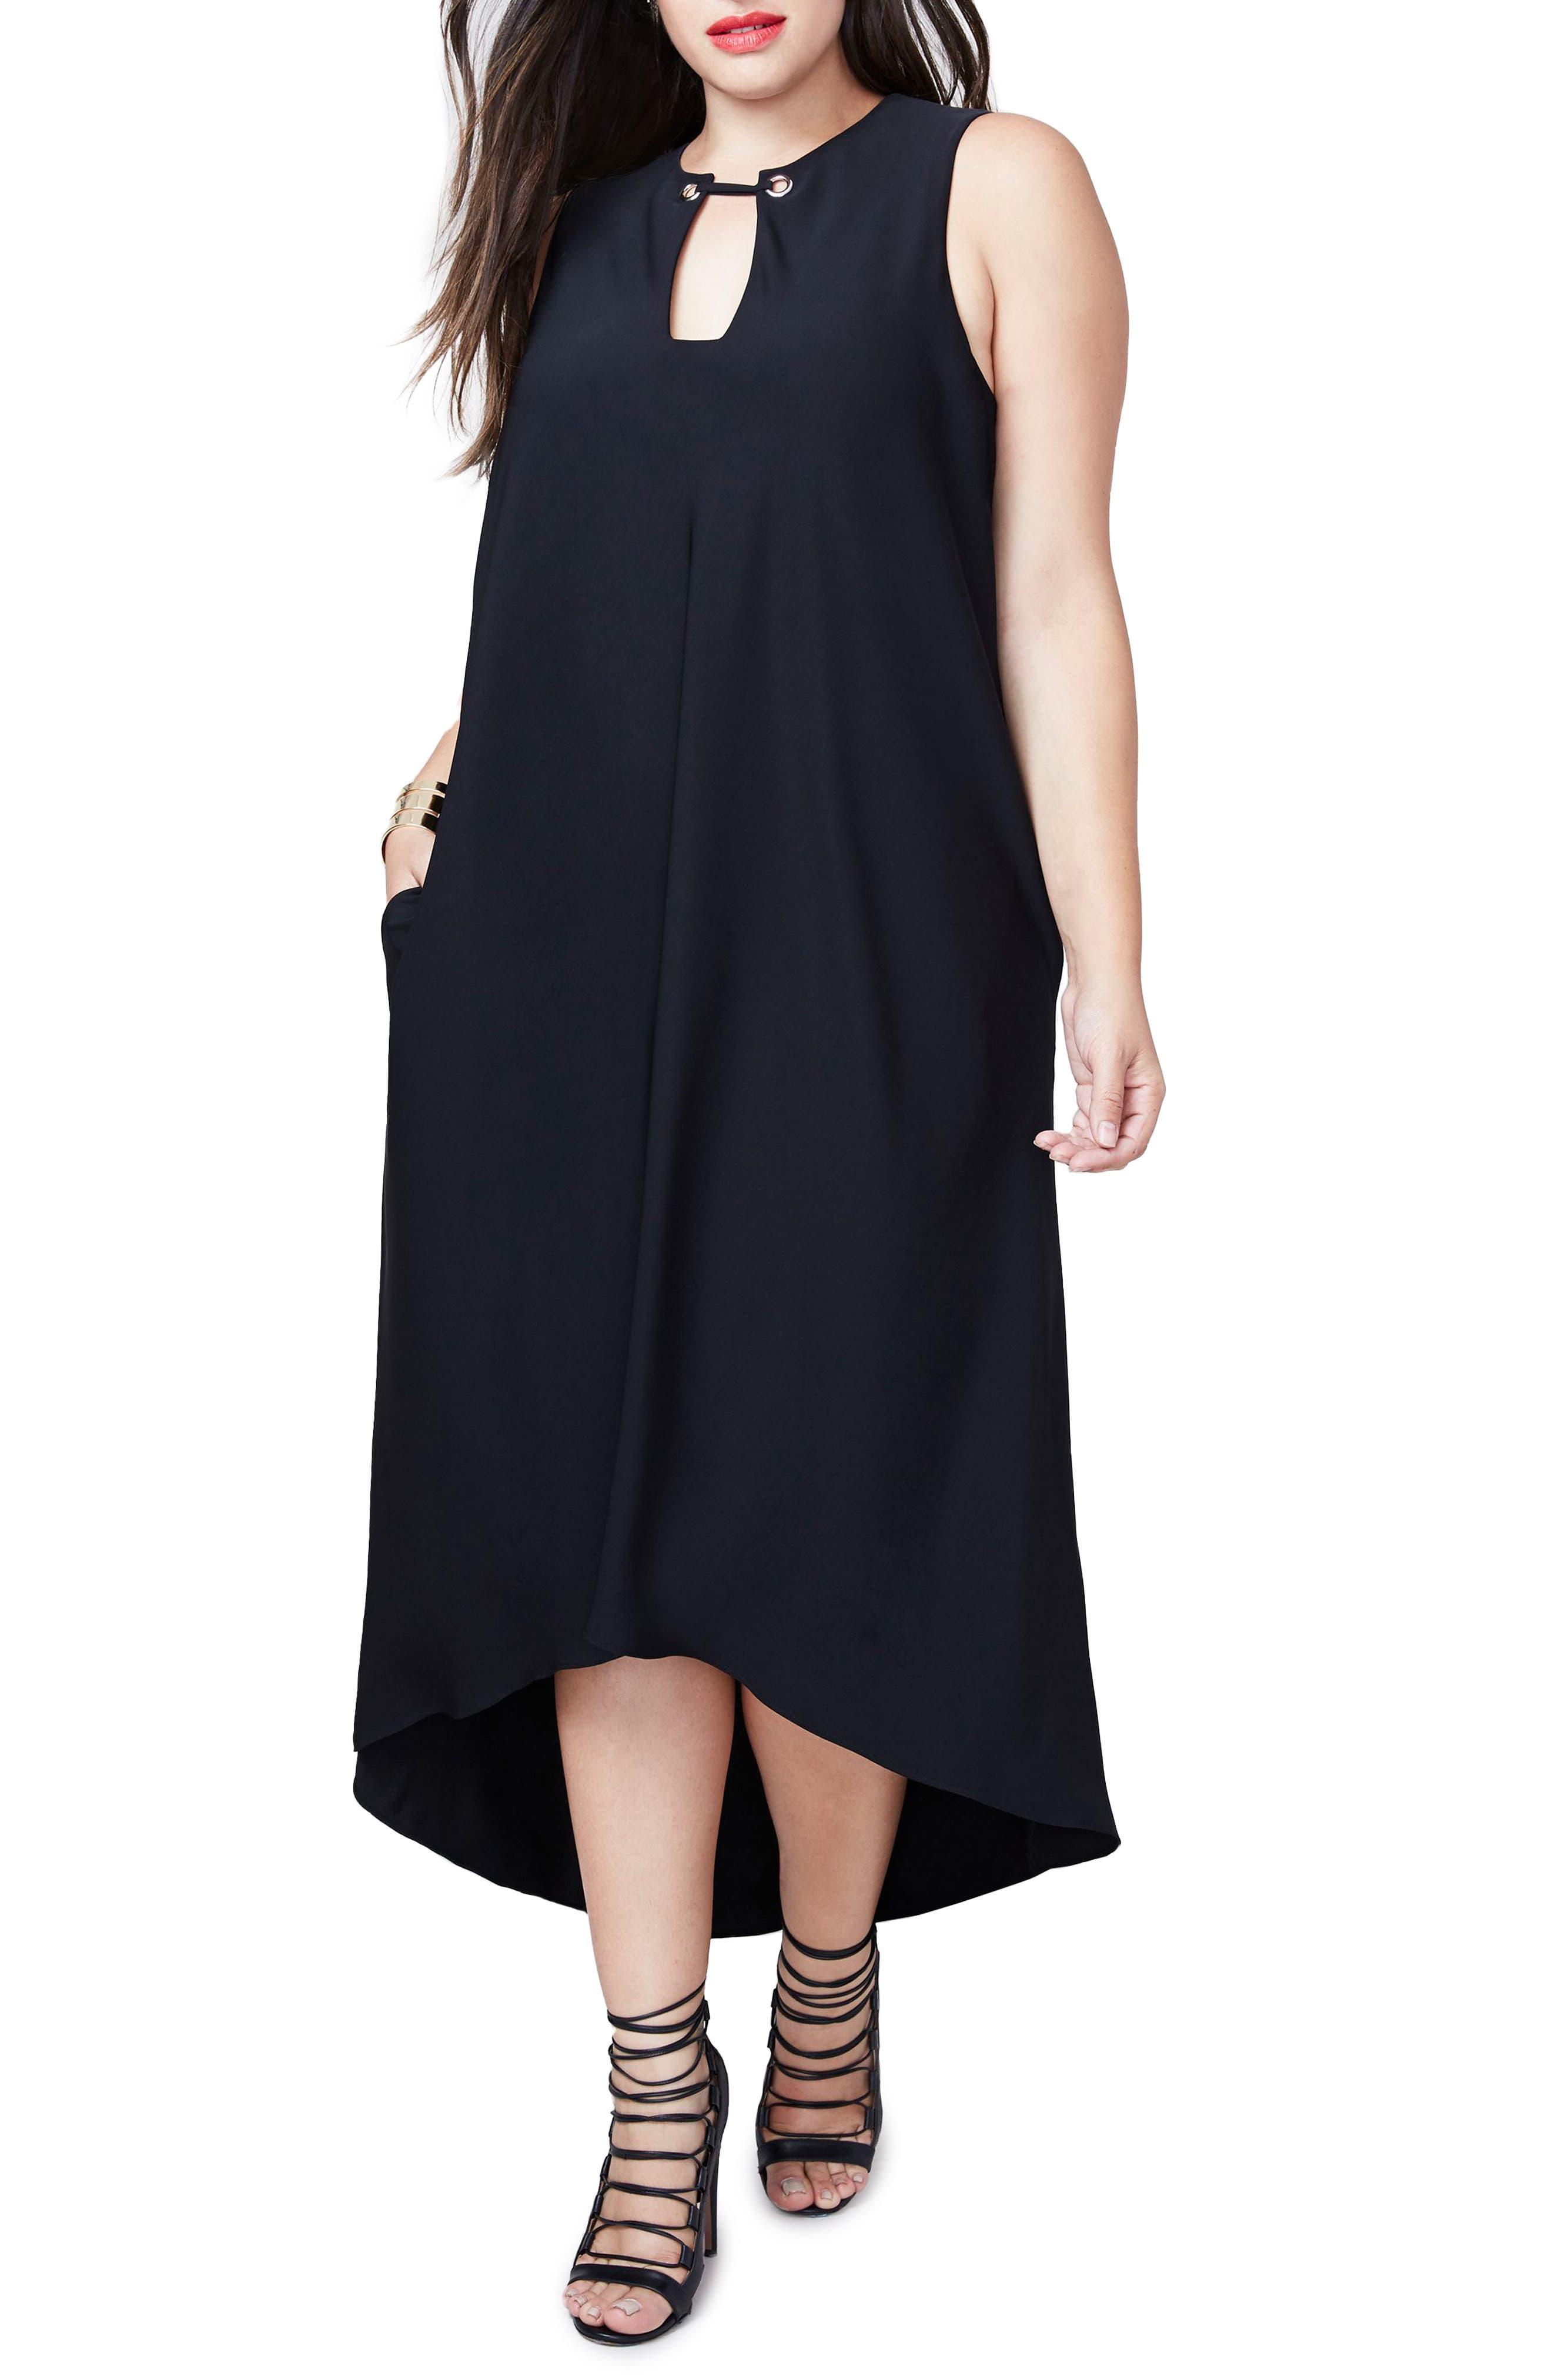 RACHEL Rachel Roy Elliptical Hem Shift Dress,                         Main,                         color, Black